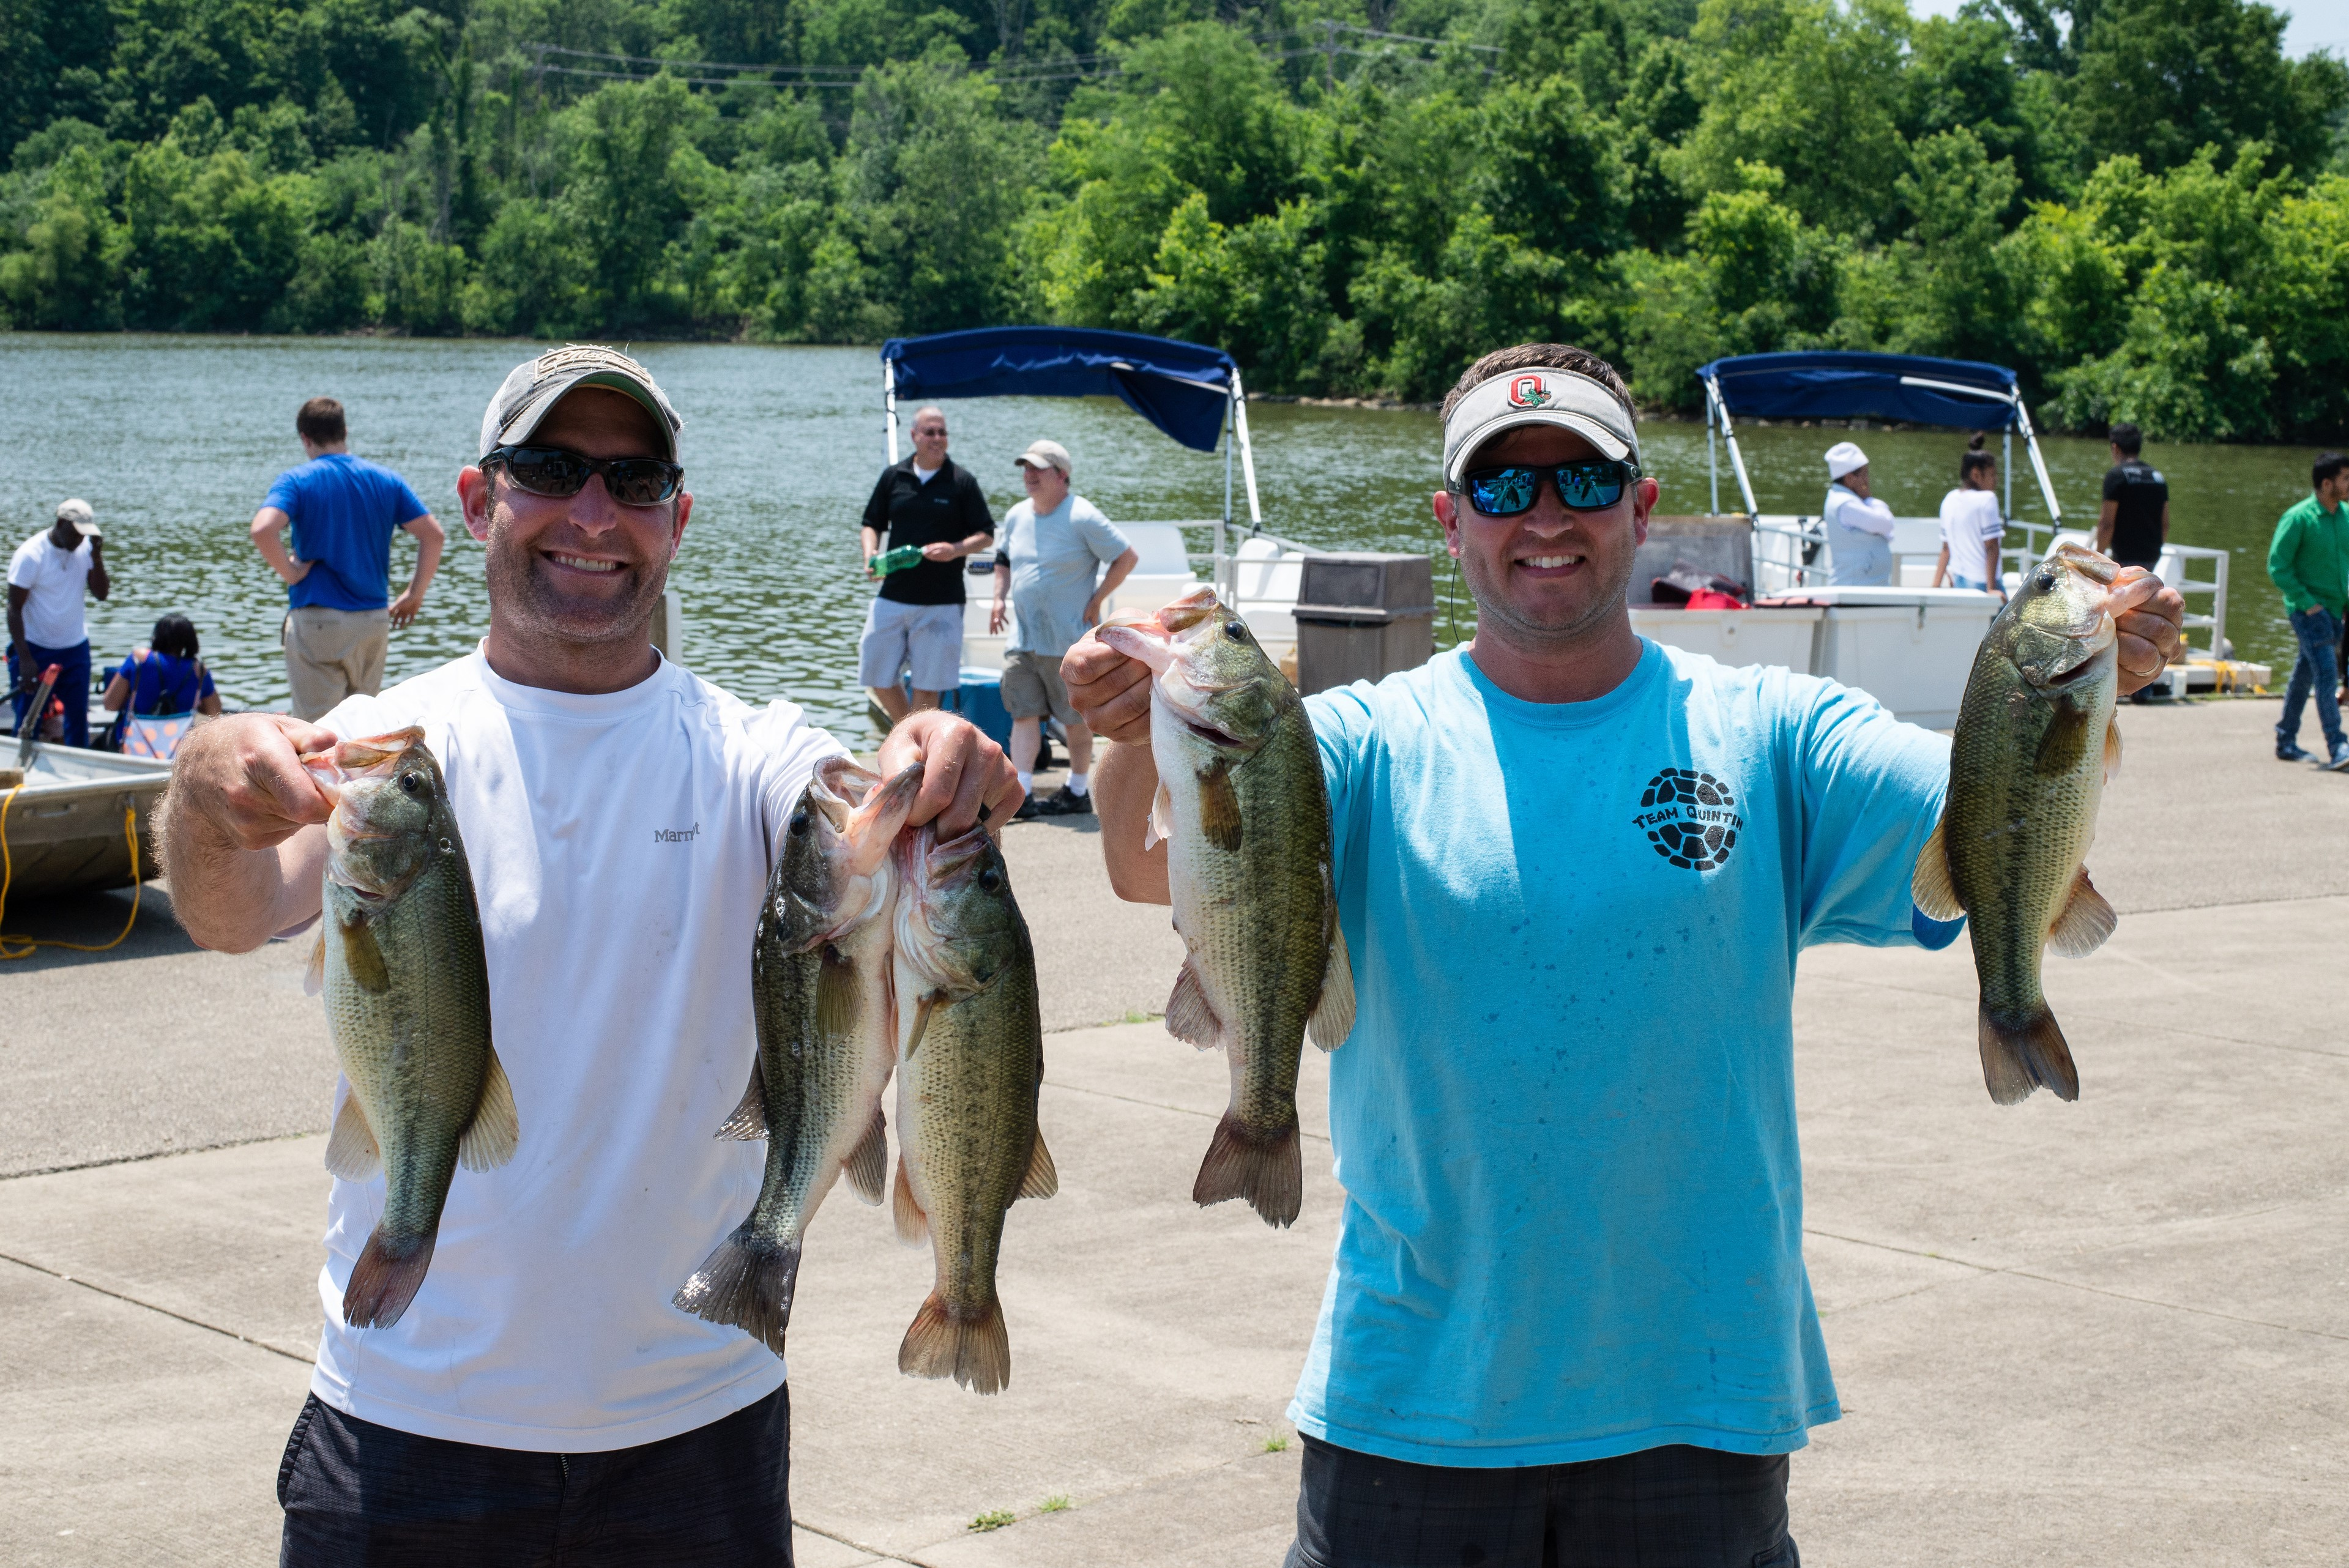 July 14 Bass Series Ryan Zwick and Brent Jones